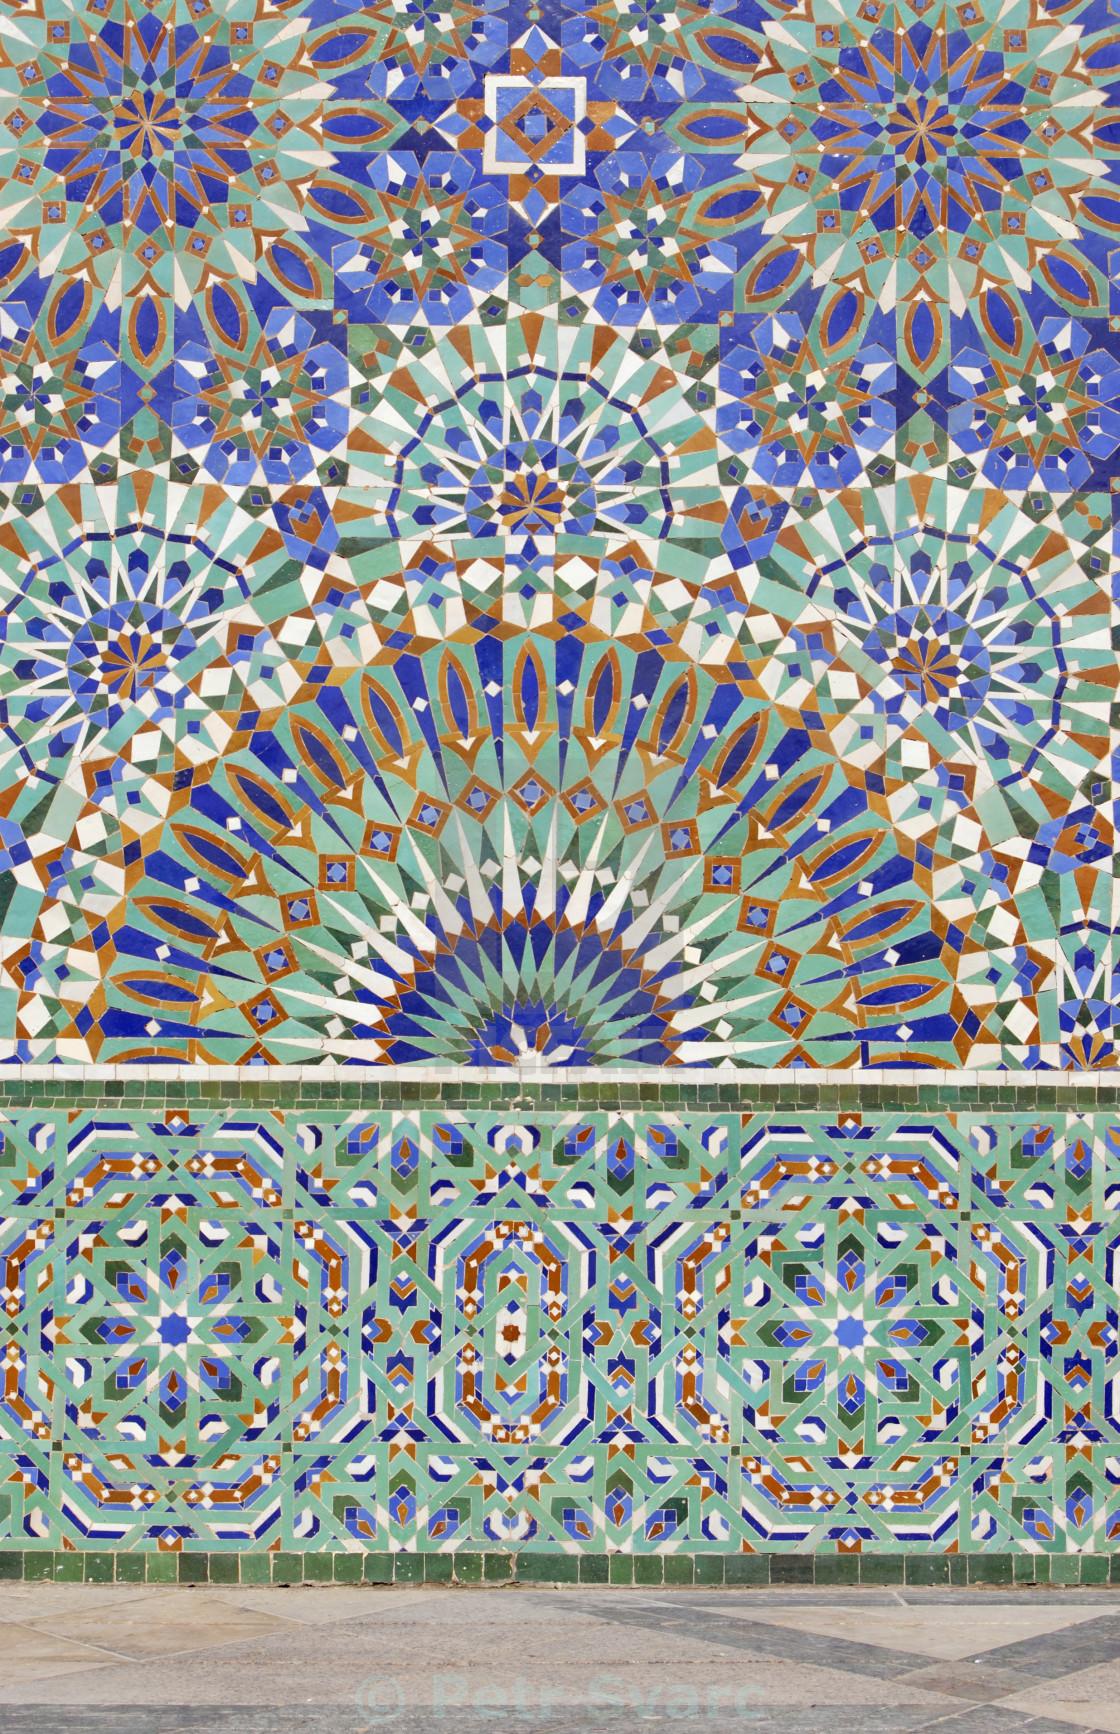 """Mosaic, Hassan II Mosque, Casablanca, Morocco"" stock image"